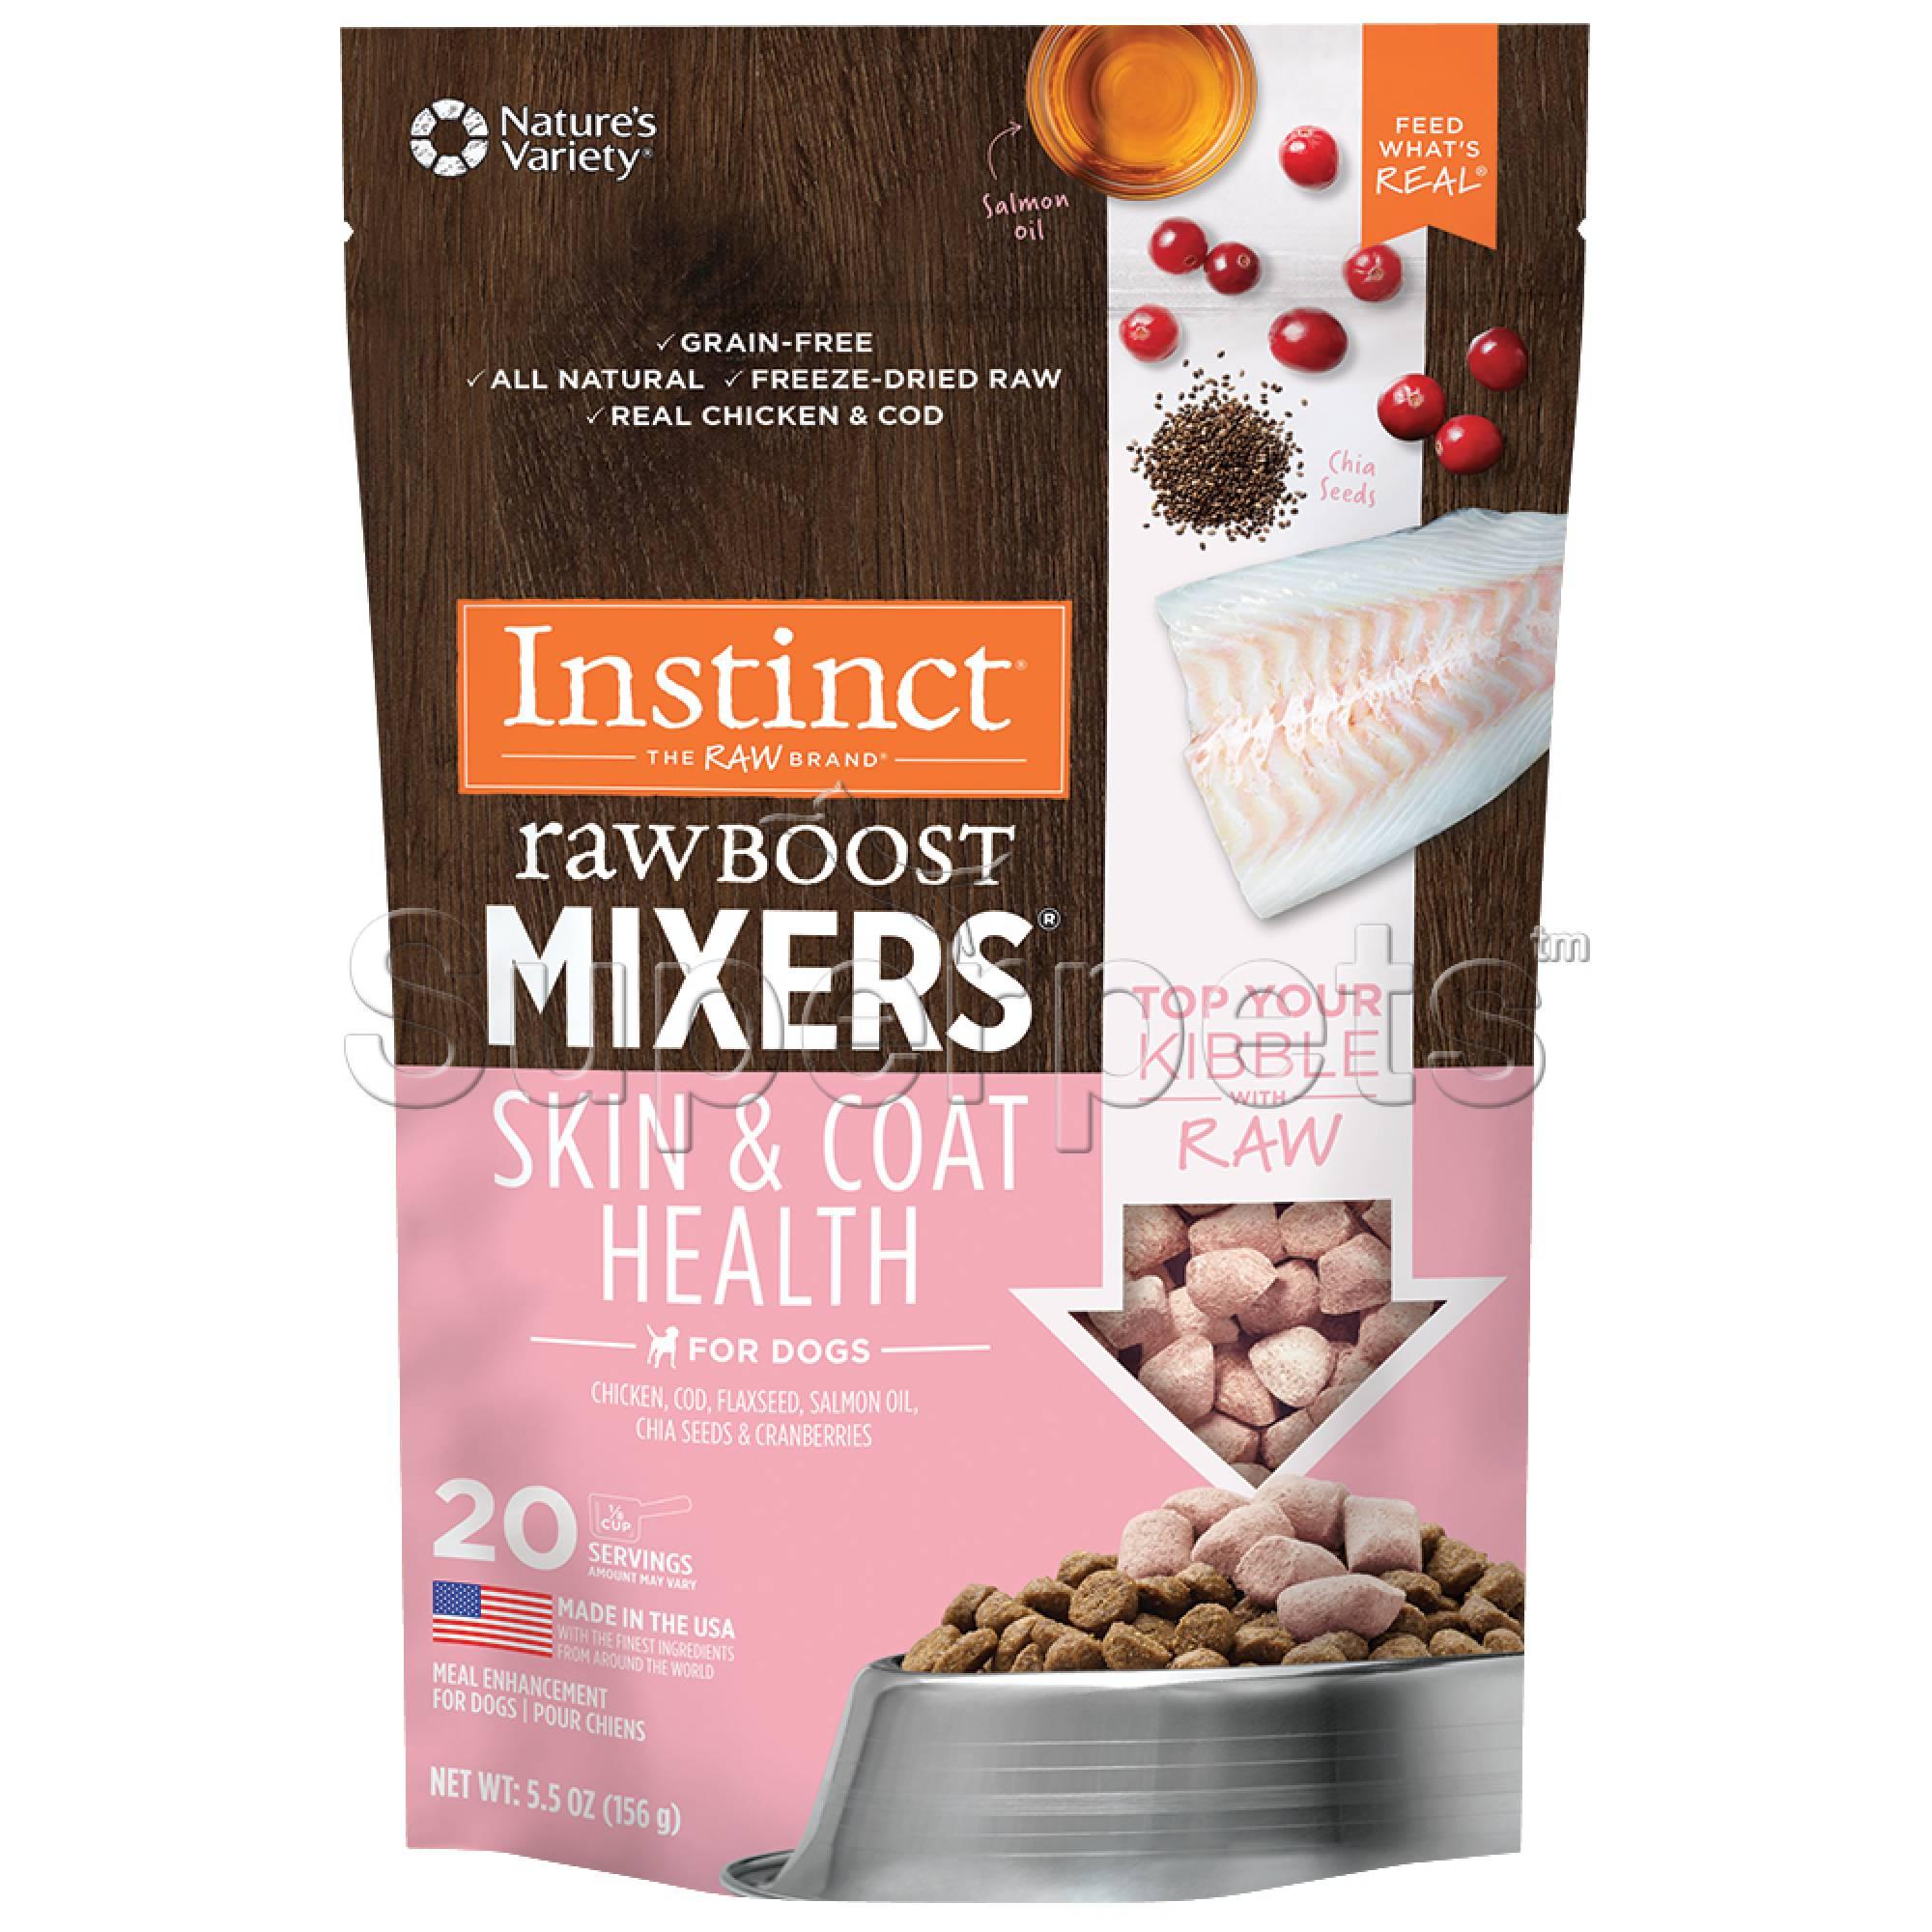 Instinct - Dog Freeze-Dried Raw Boost Mixers Grain-Free Skin & Coat 5.5oz (156g)